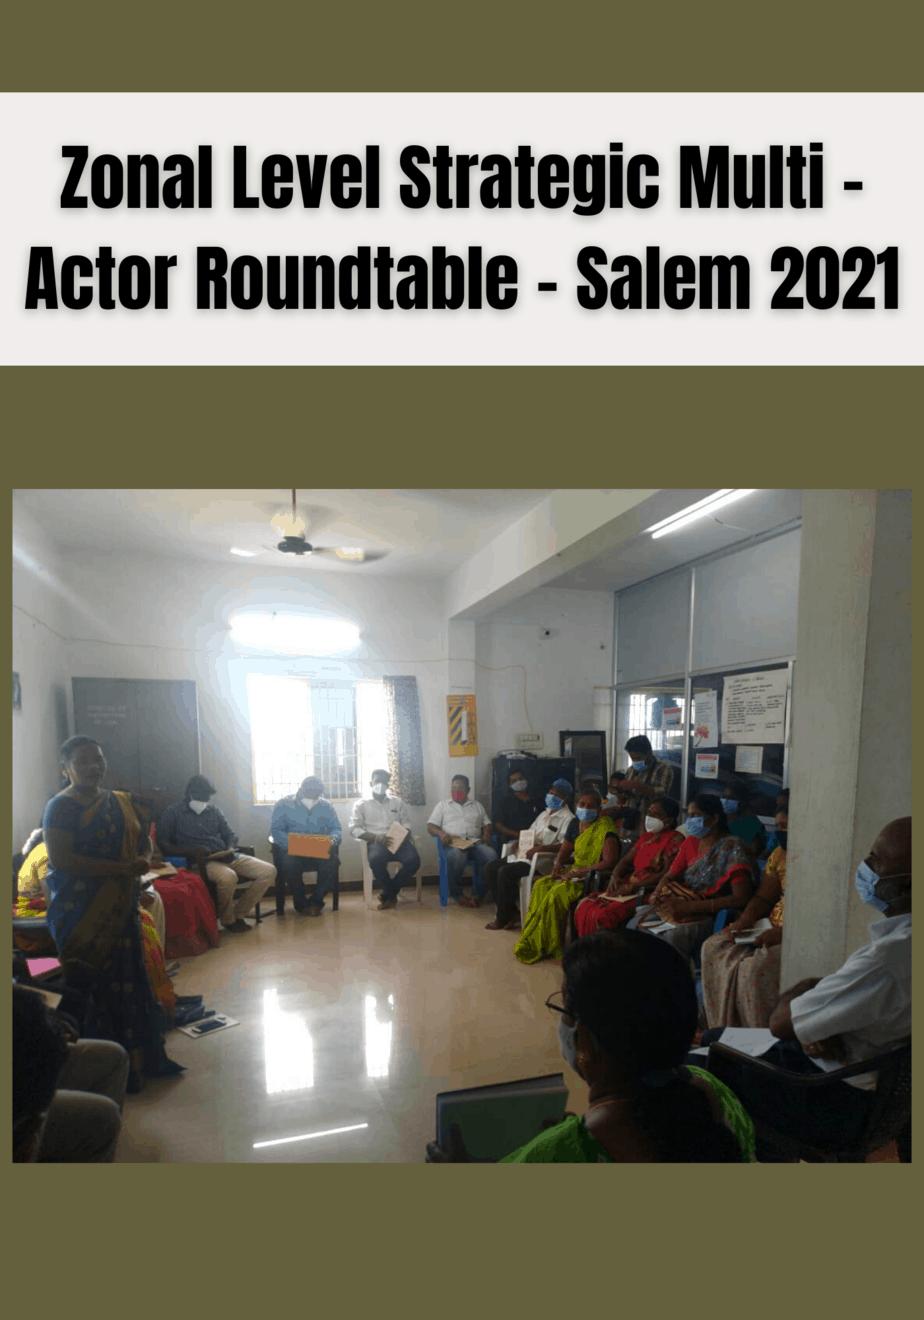 Annual Z-SMART 2021 – Salem